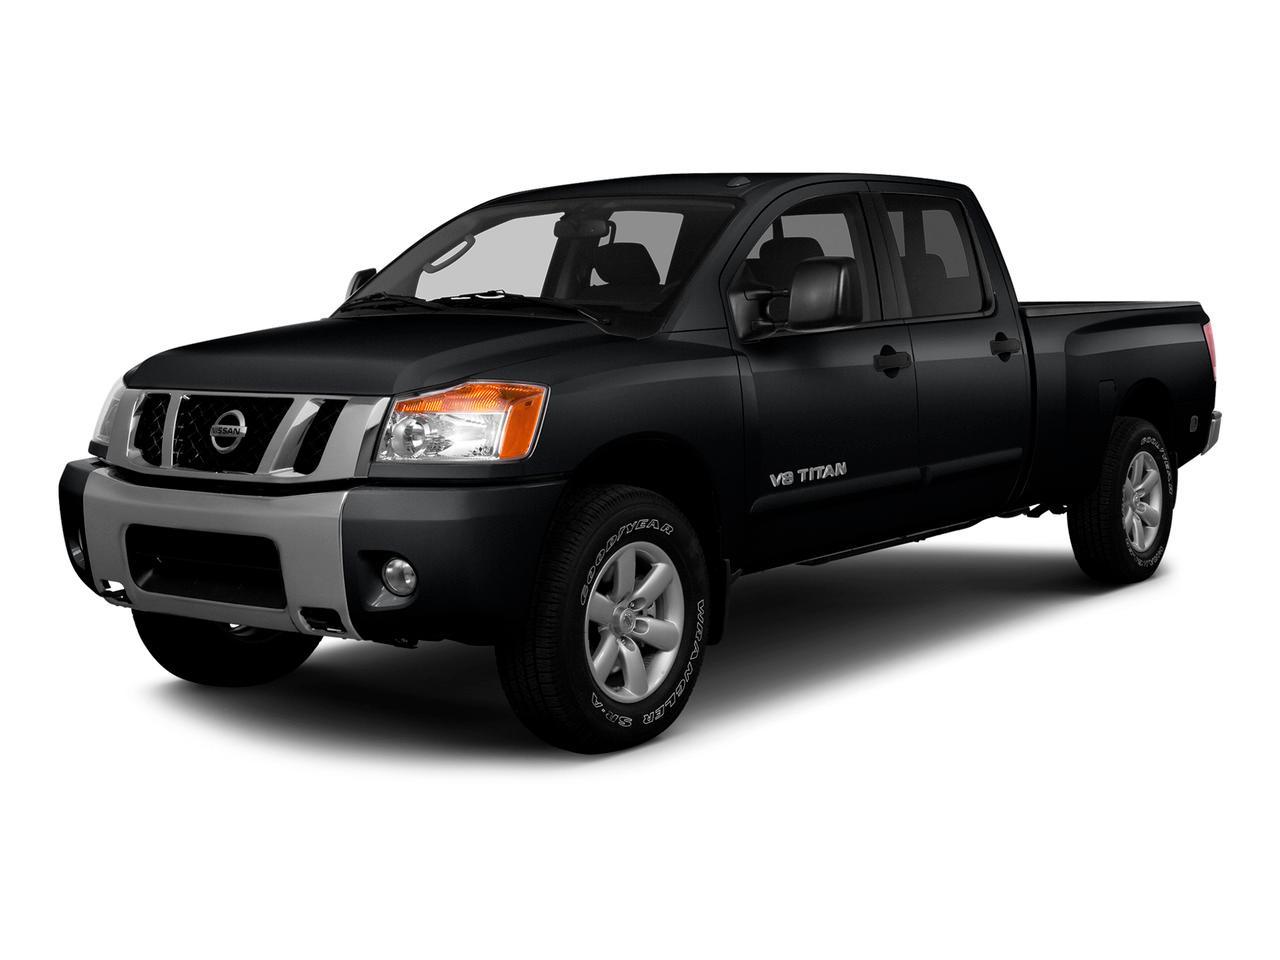 2015 Nissan Titan Vehicle Photo in Shreveport, LA 71105